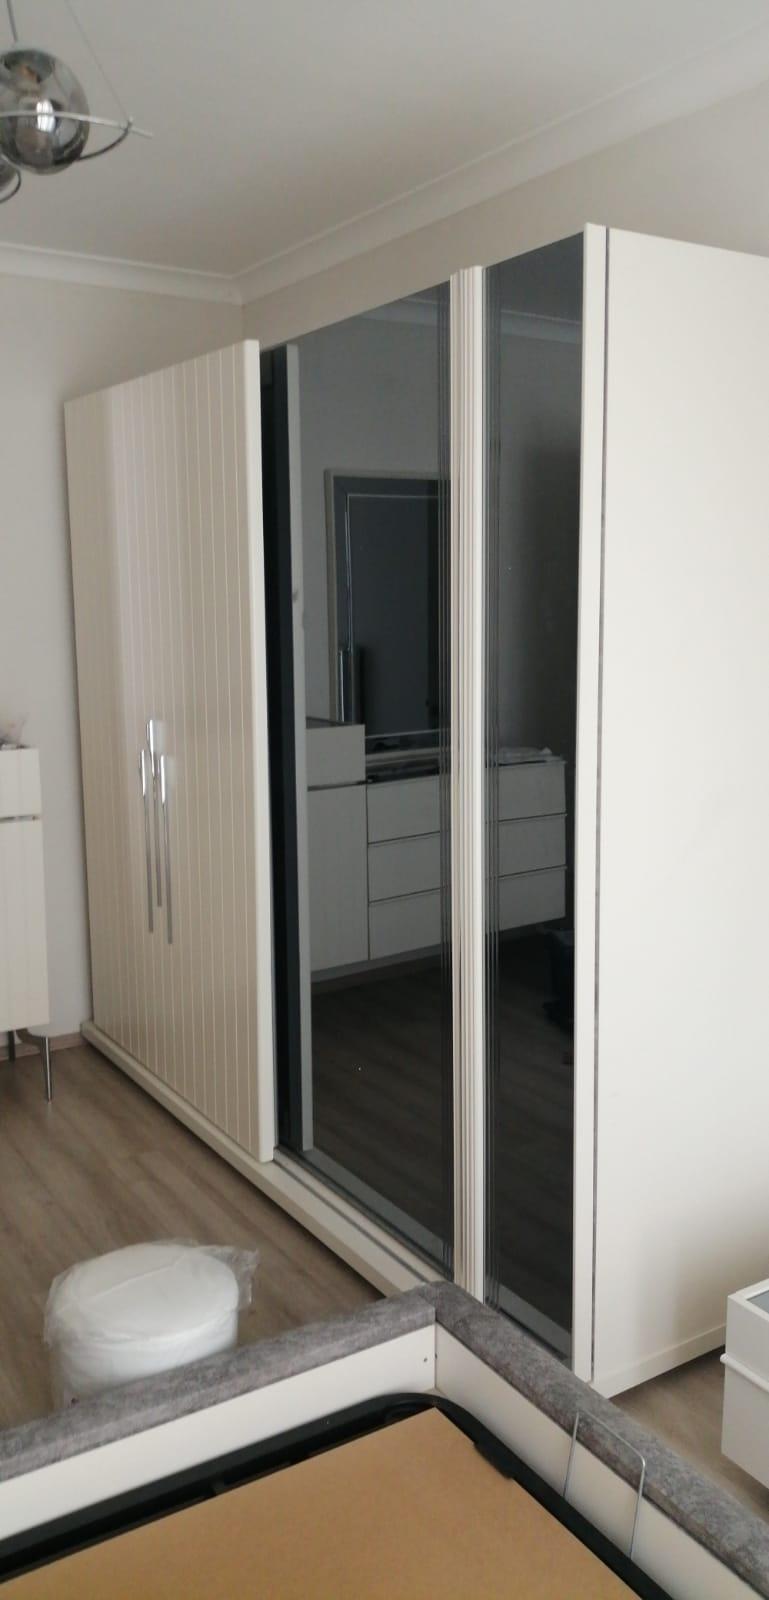 Selçuk Bey - Bursa